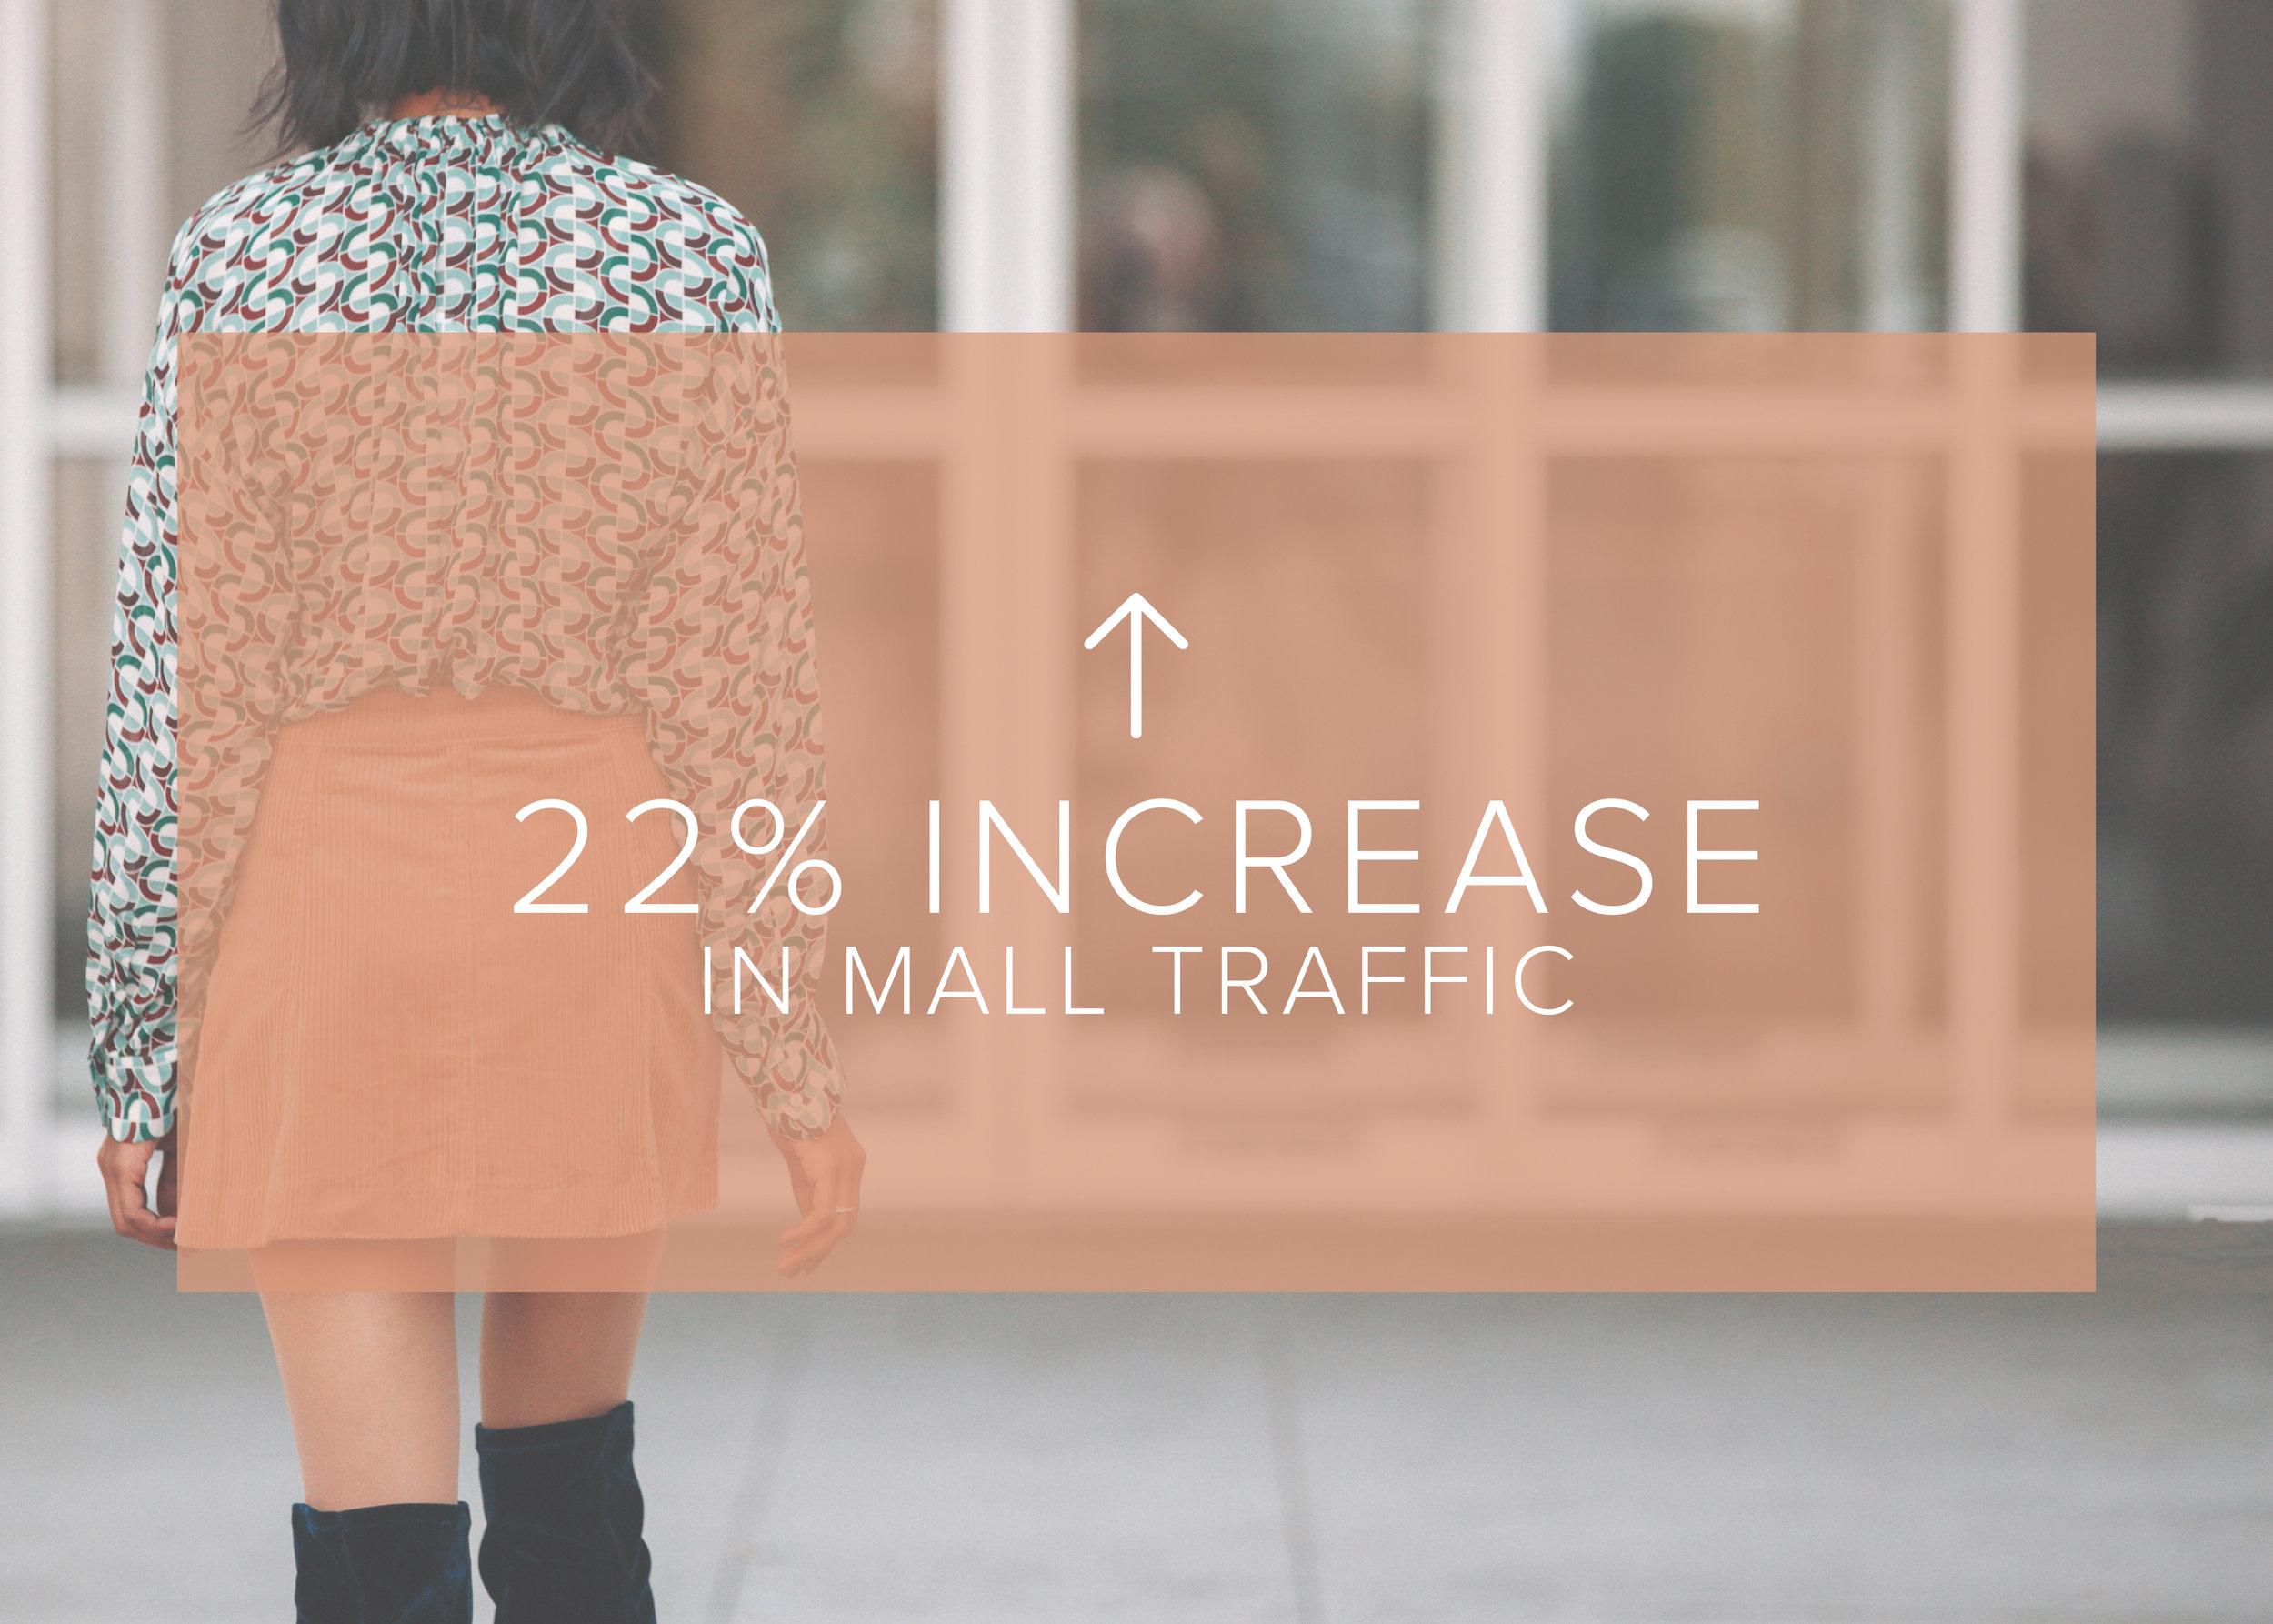 22% Traffic Increase Statistic